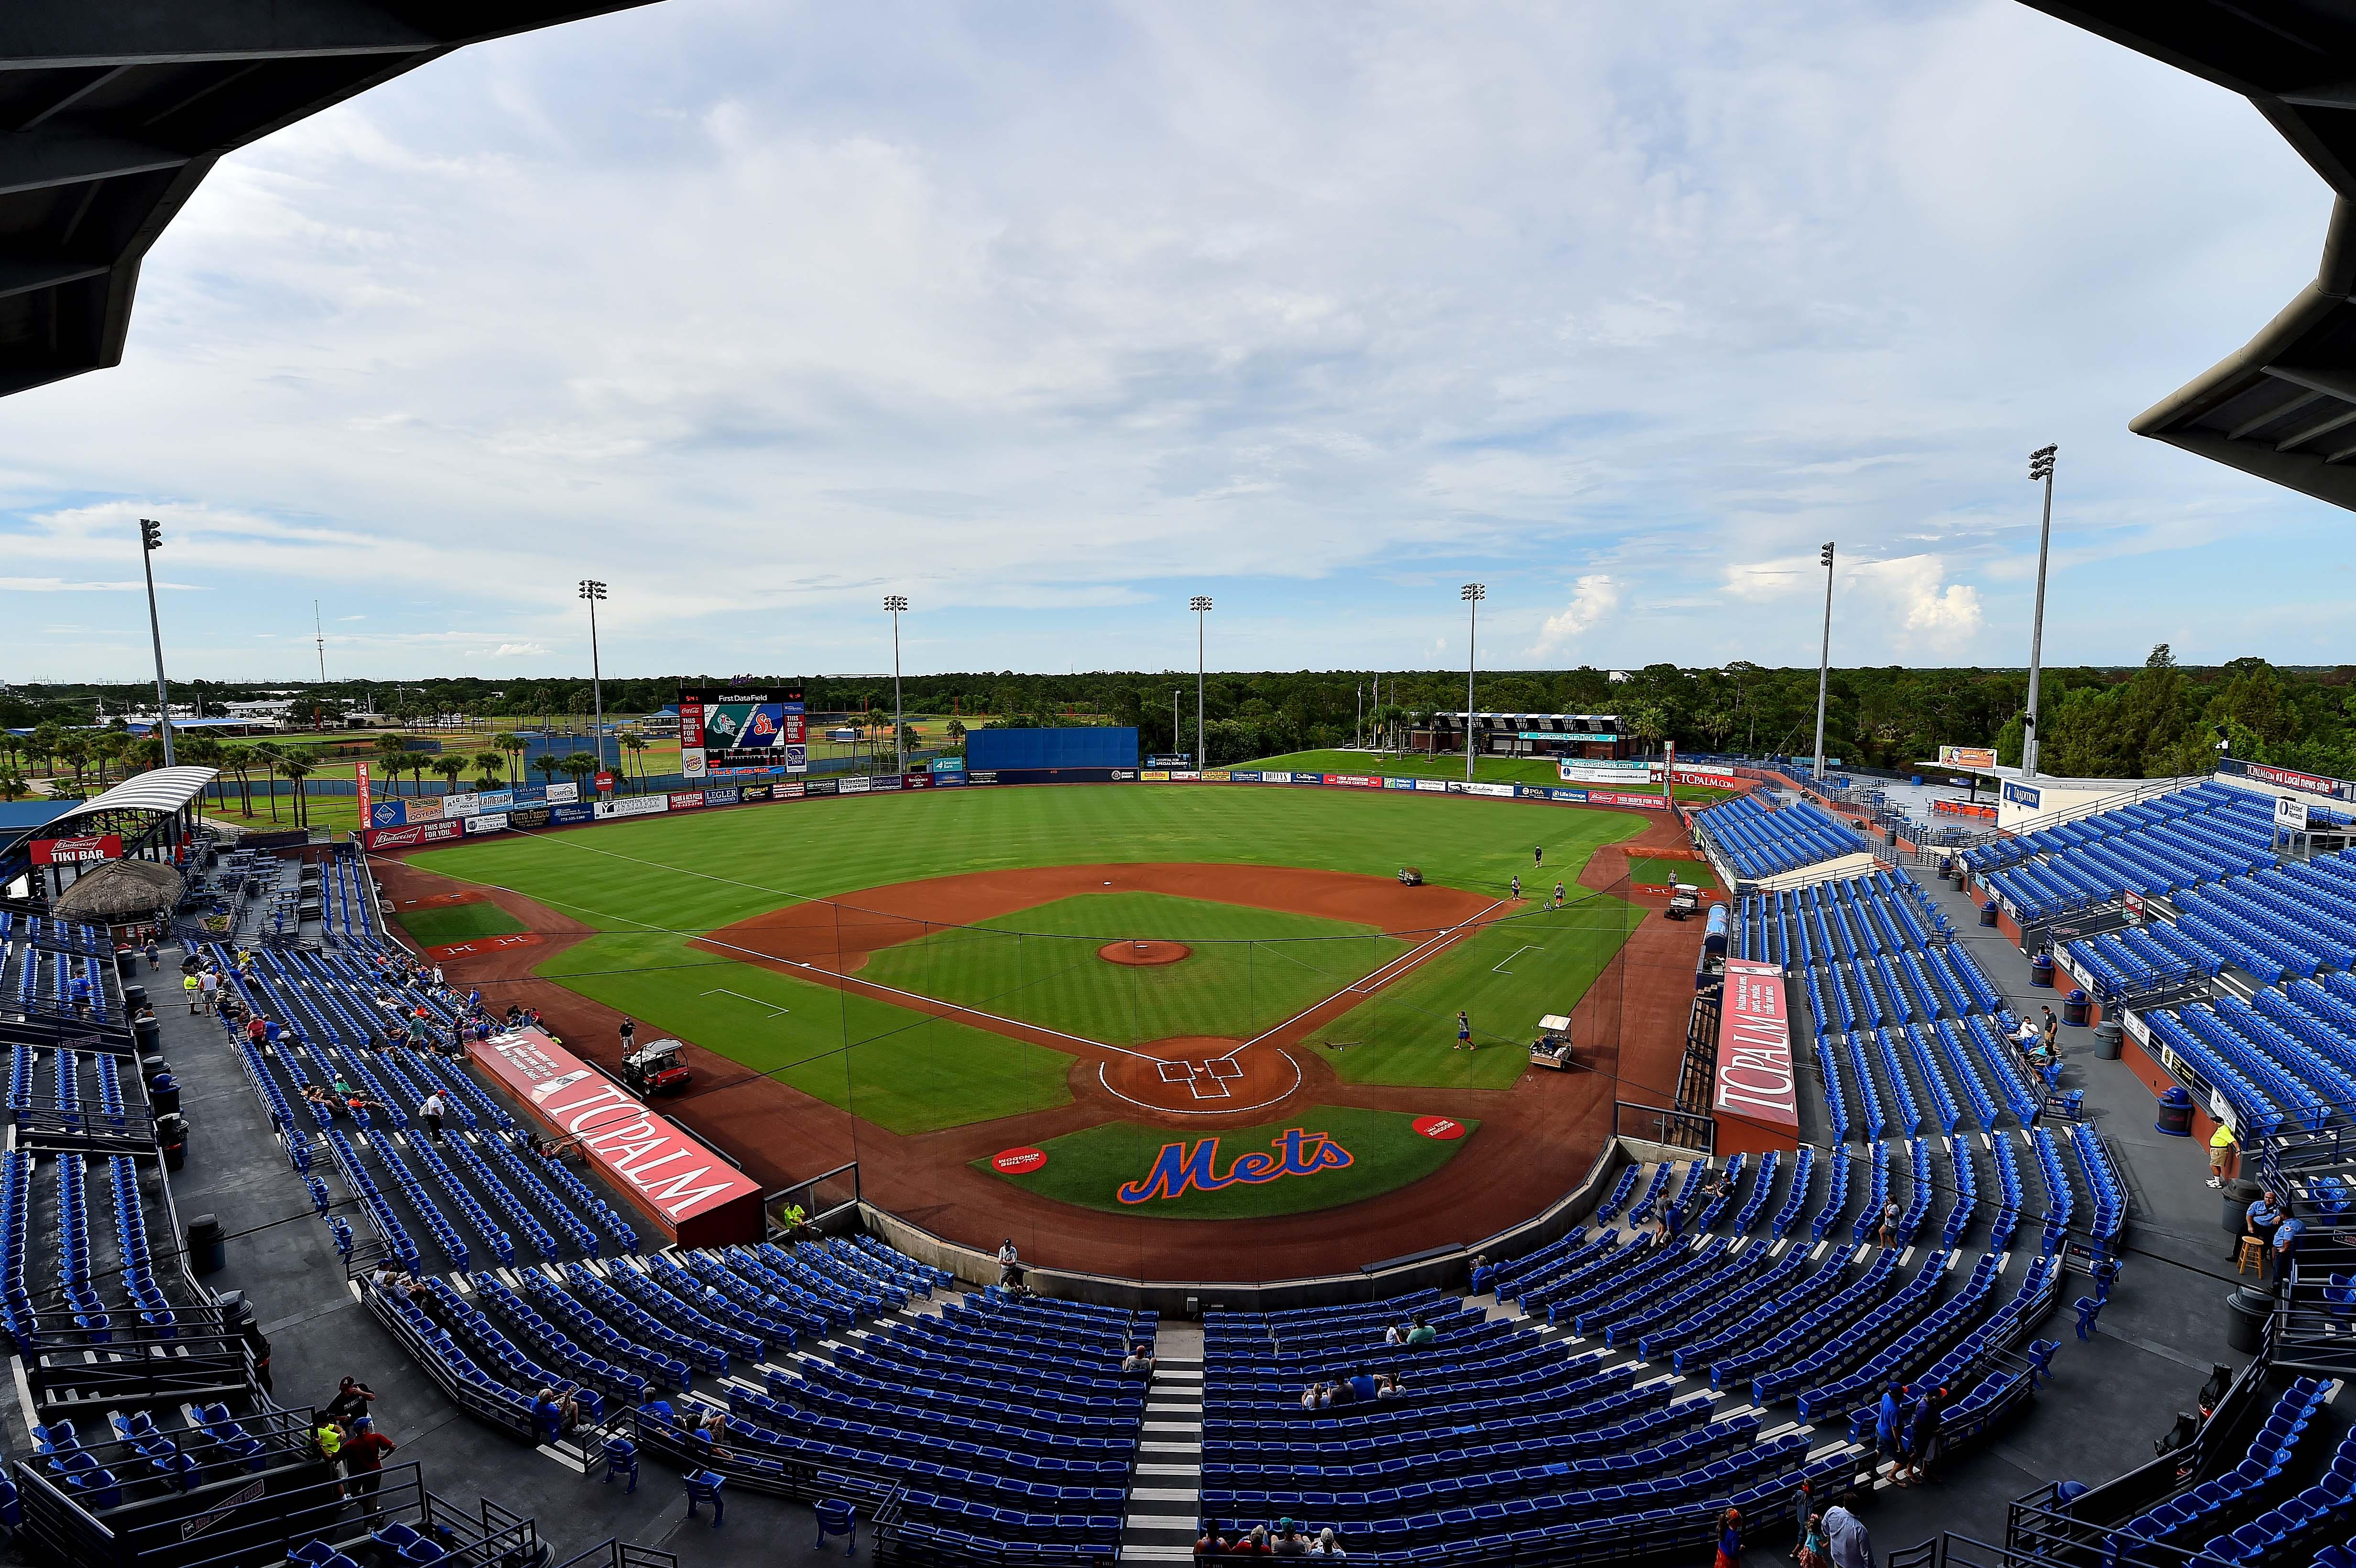 Minor League Baseball: Jupiter Hammerheads at Port St. Lucie Mets